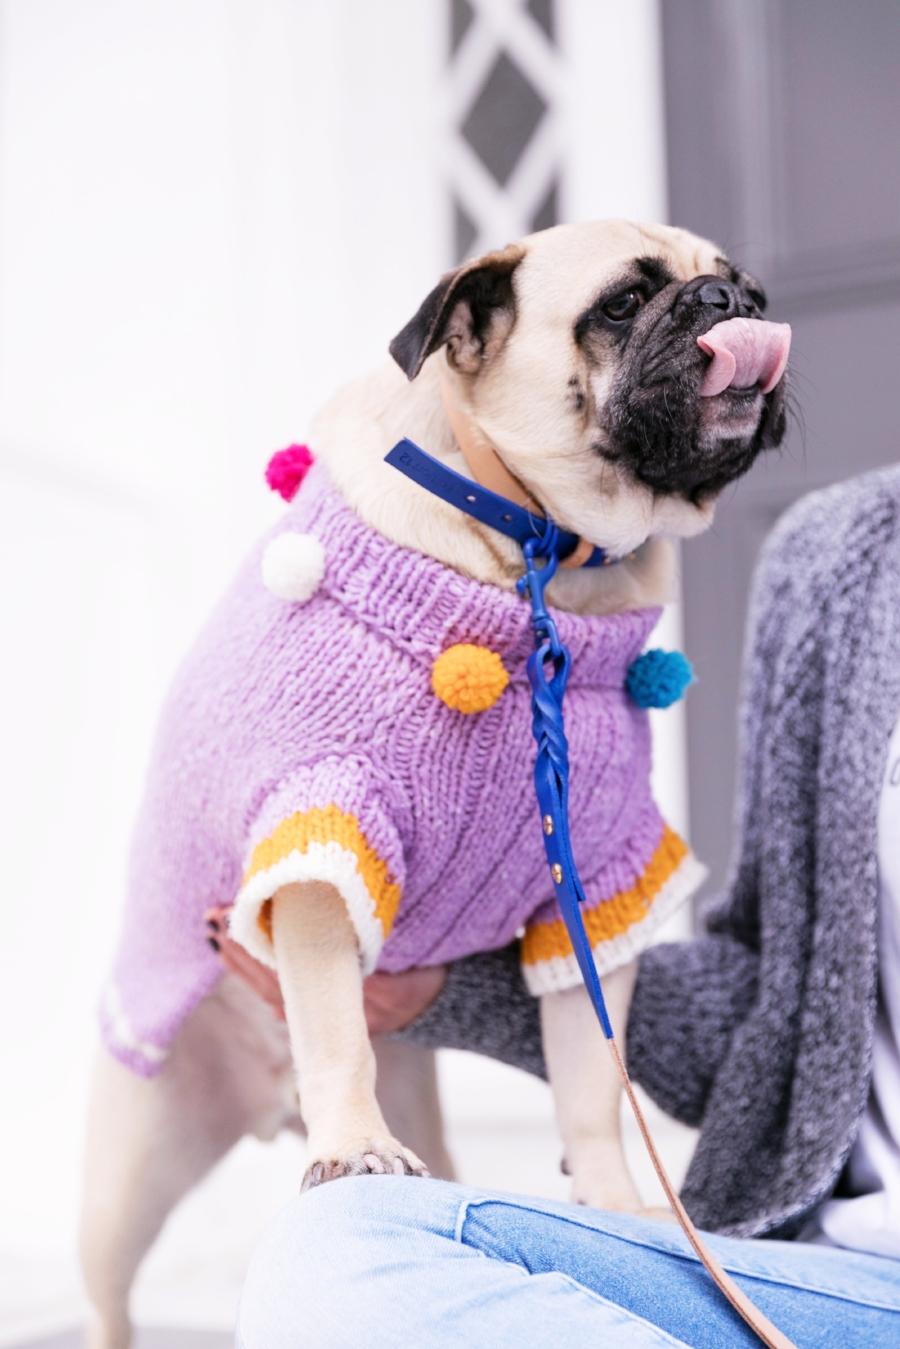 humanandhound-twinning-fashion-london-twinningiswinning-ariandm-spring-dogfashion-stylishdogs-bestdresseddog-pug-pugfashion-dogsinclothes-springjumper-best-dogfashionblog-dogblog-bestdogblog-topdogblog-humanandhoundblog-bestdogbloginlondonstreetstyle-londonstreetstyle-humanandhoundstreetstyle